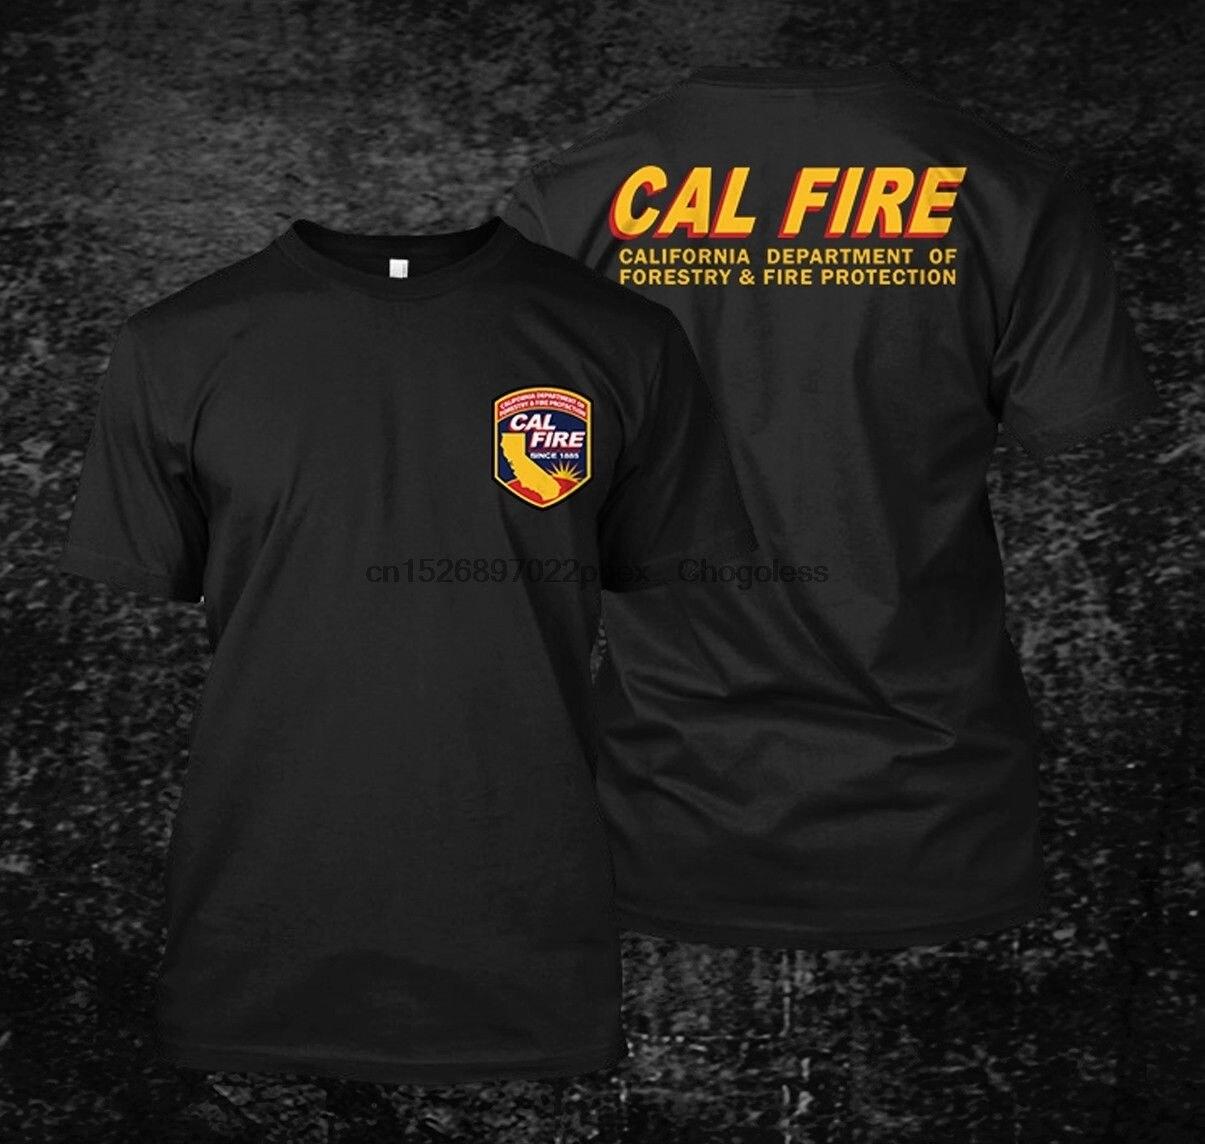 Camiseta masculina de manga curta cal fire california